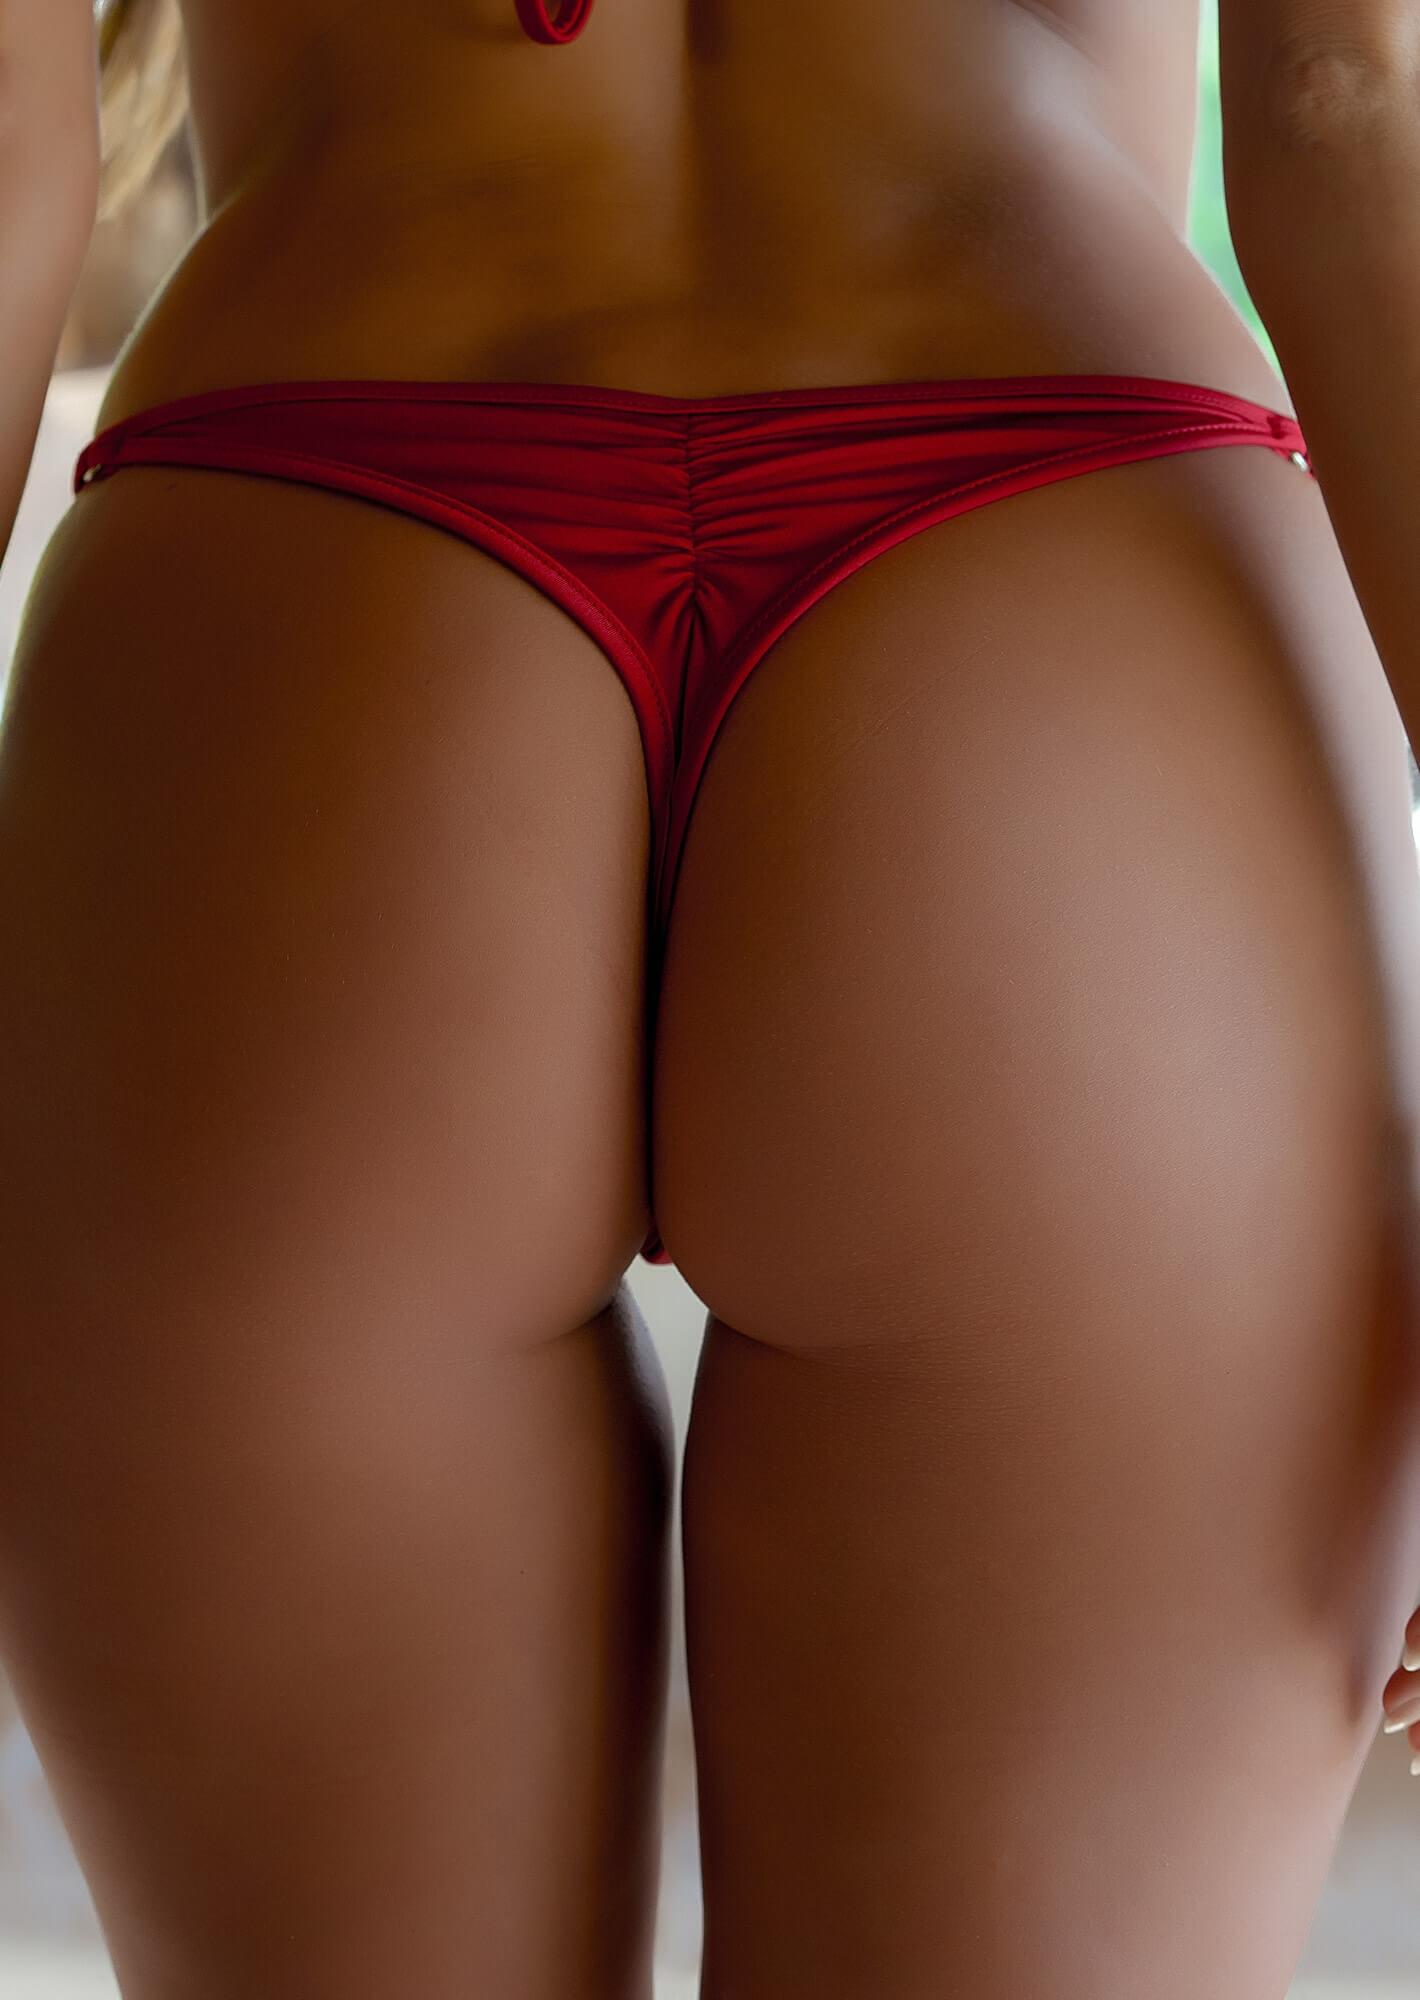 Bikini thong bottoms